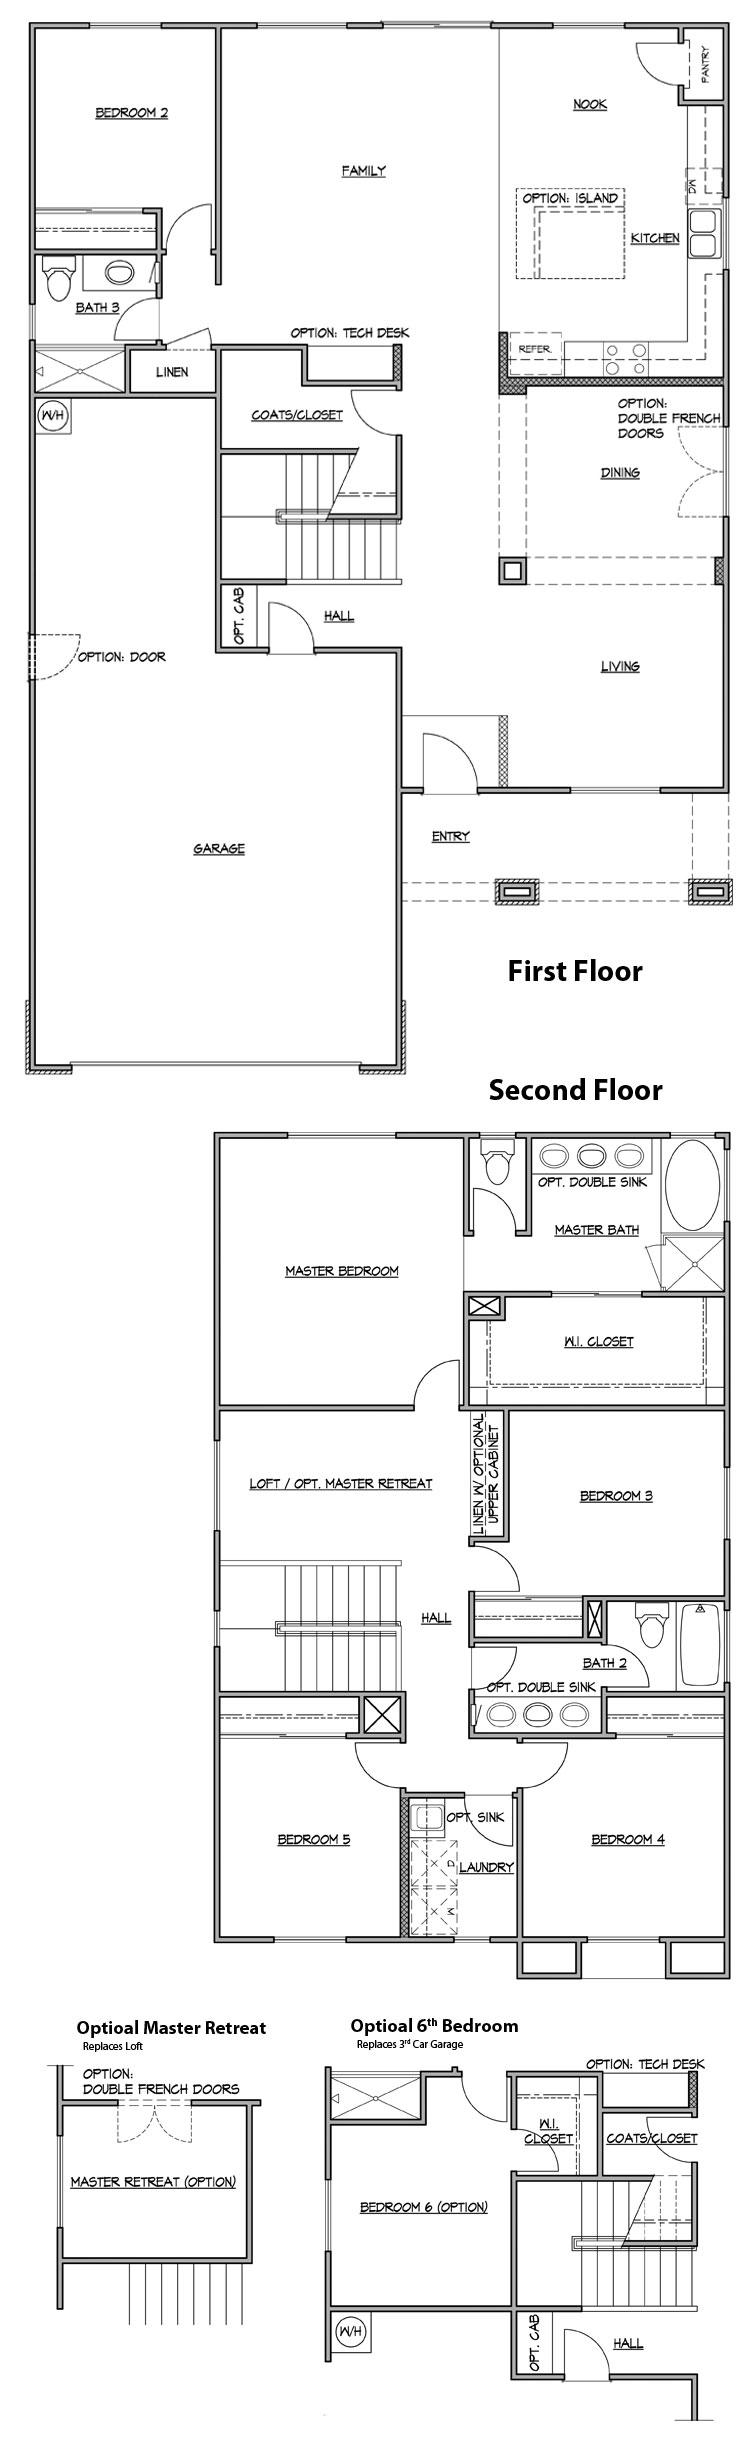 VDV - Residence 5 Floorplan